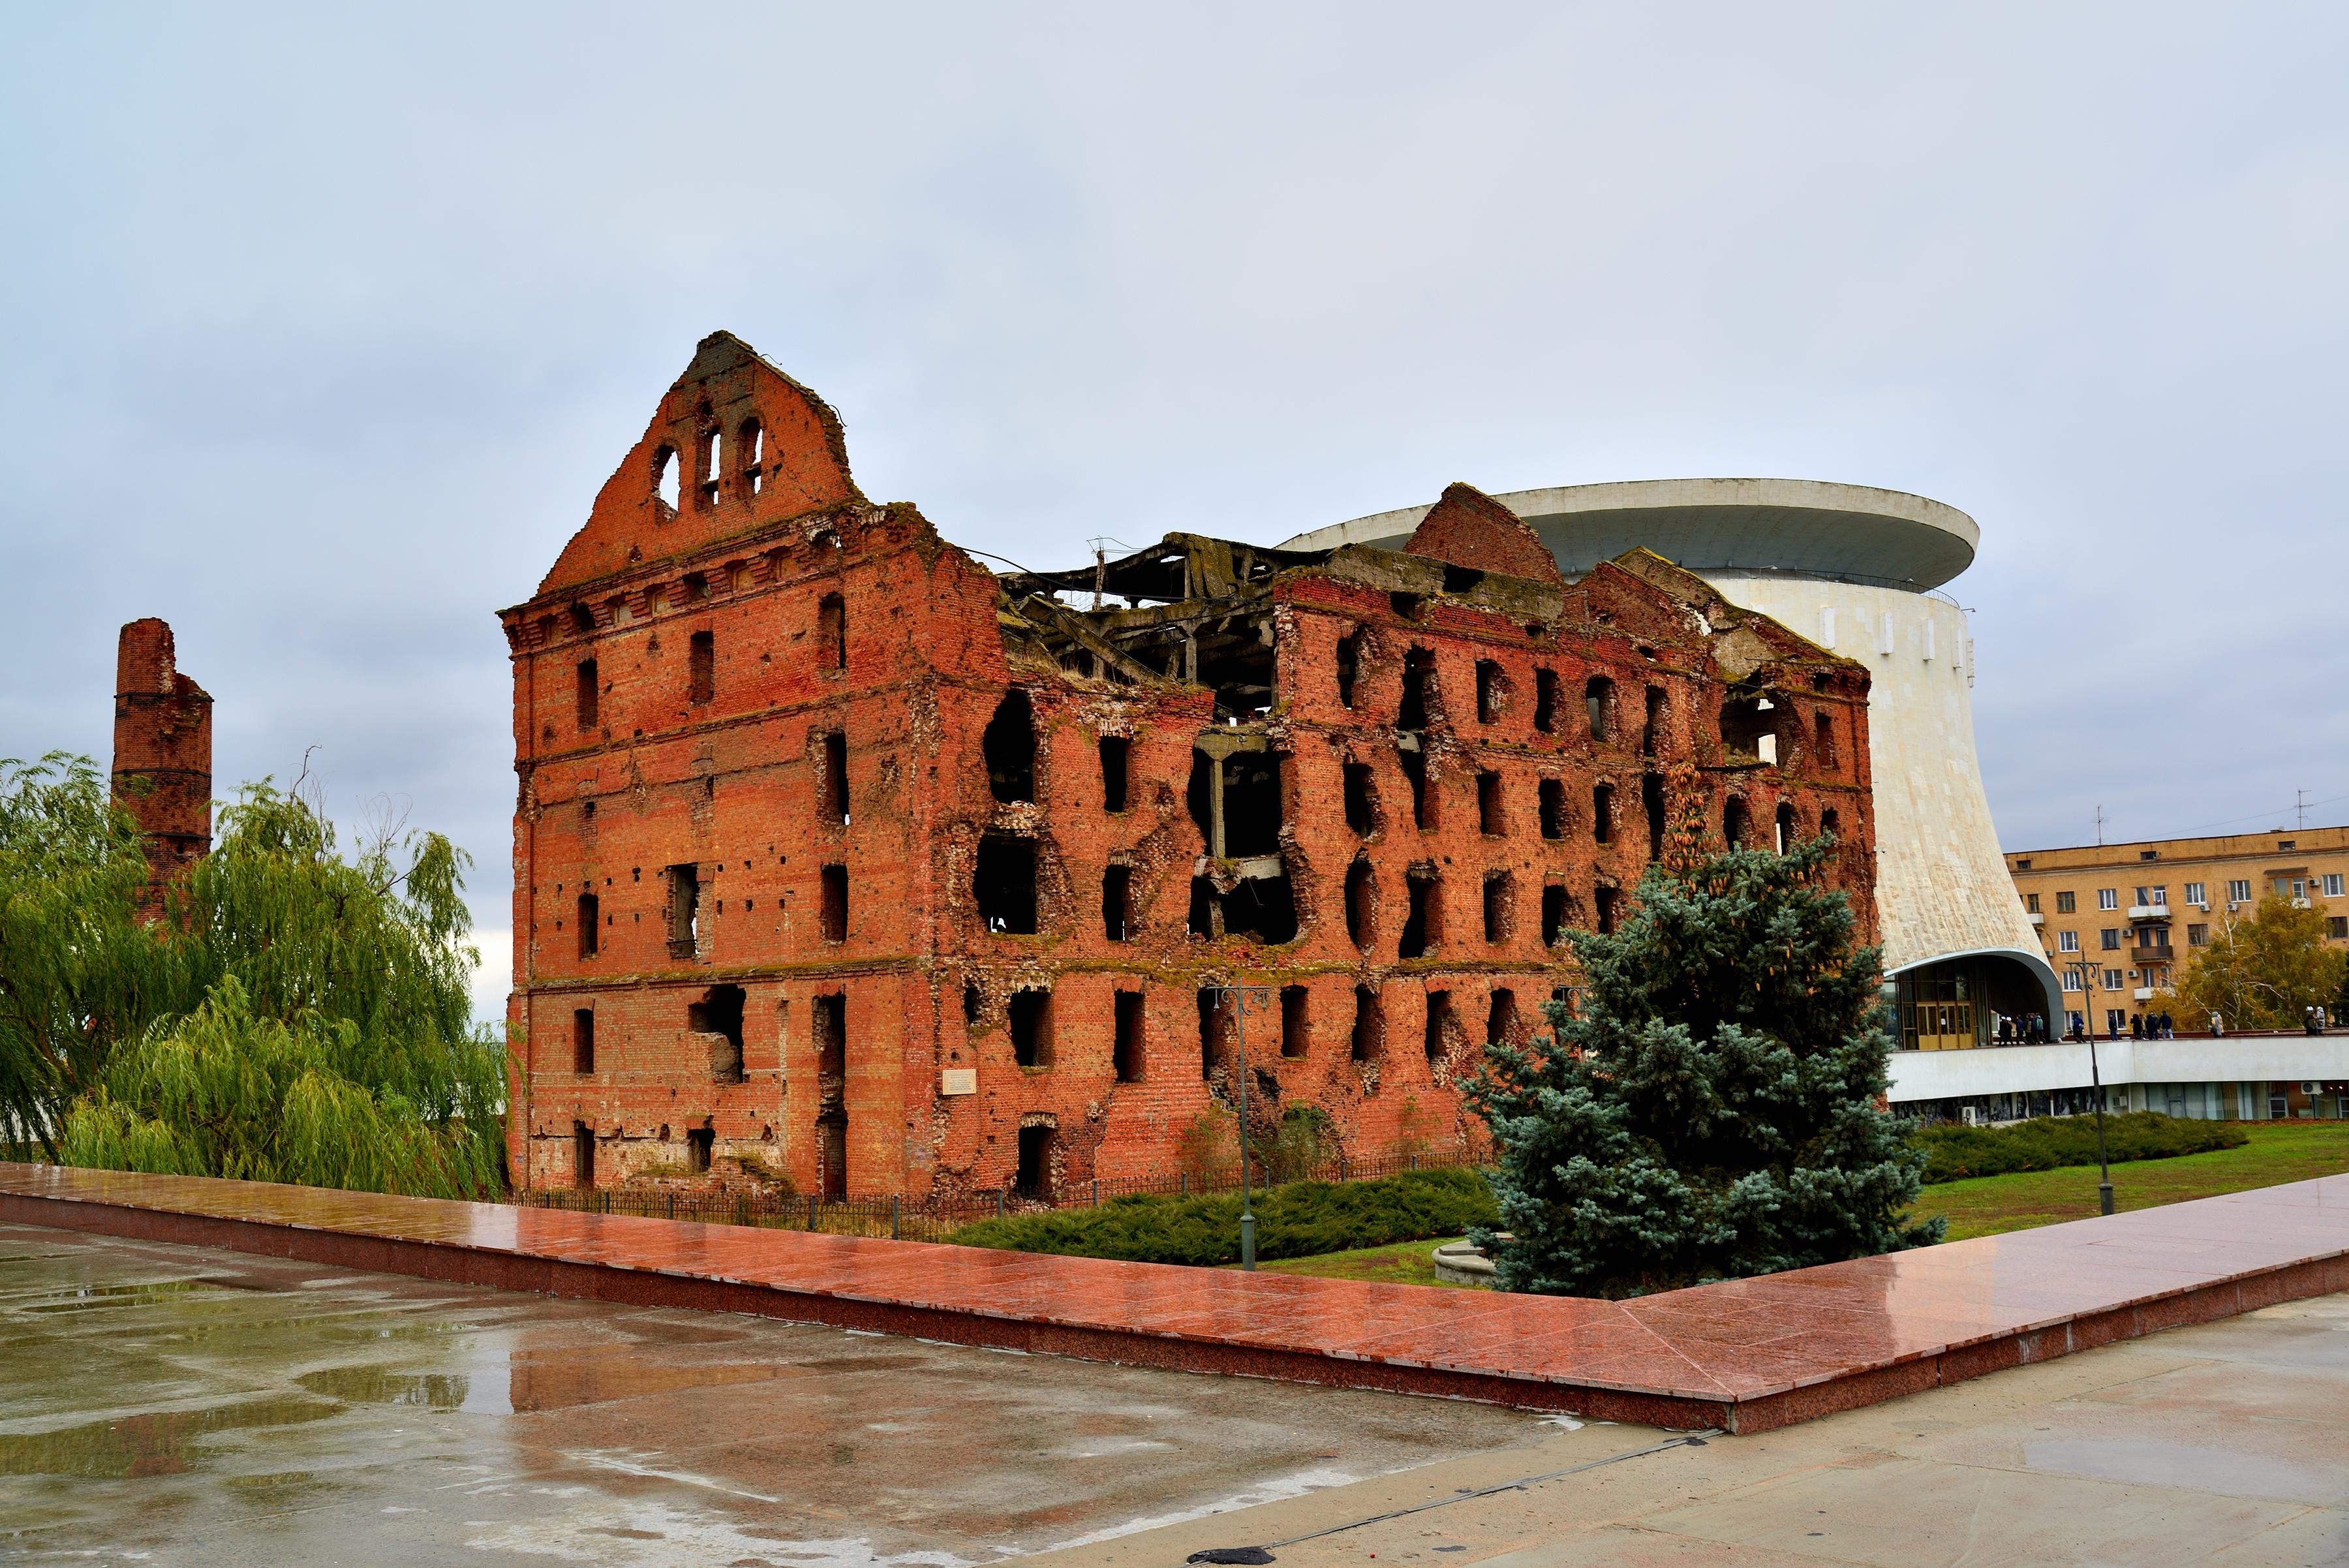 Мельница Грудинина (Гергардта)